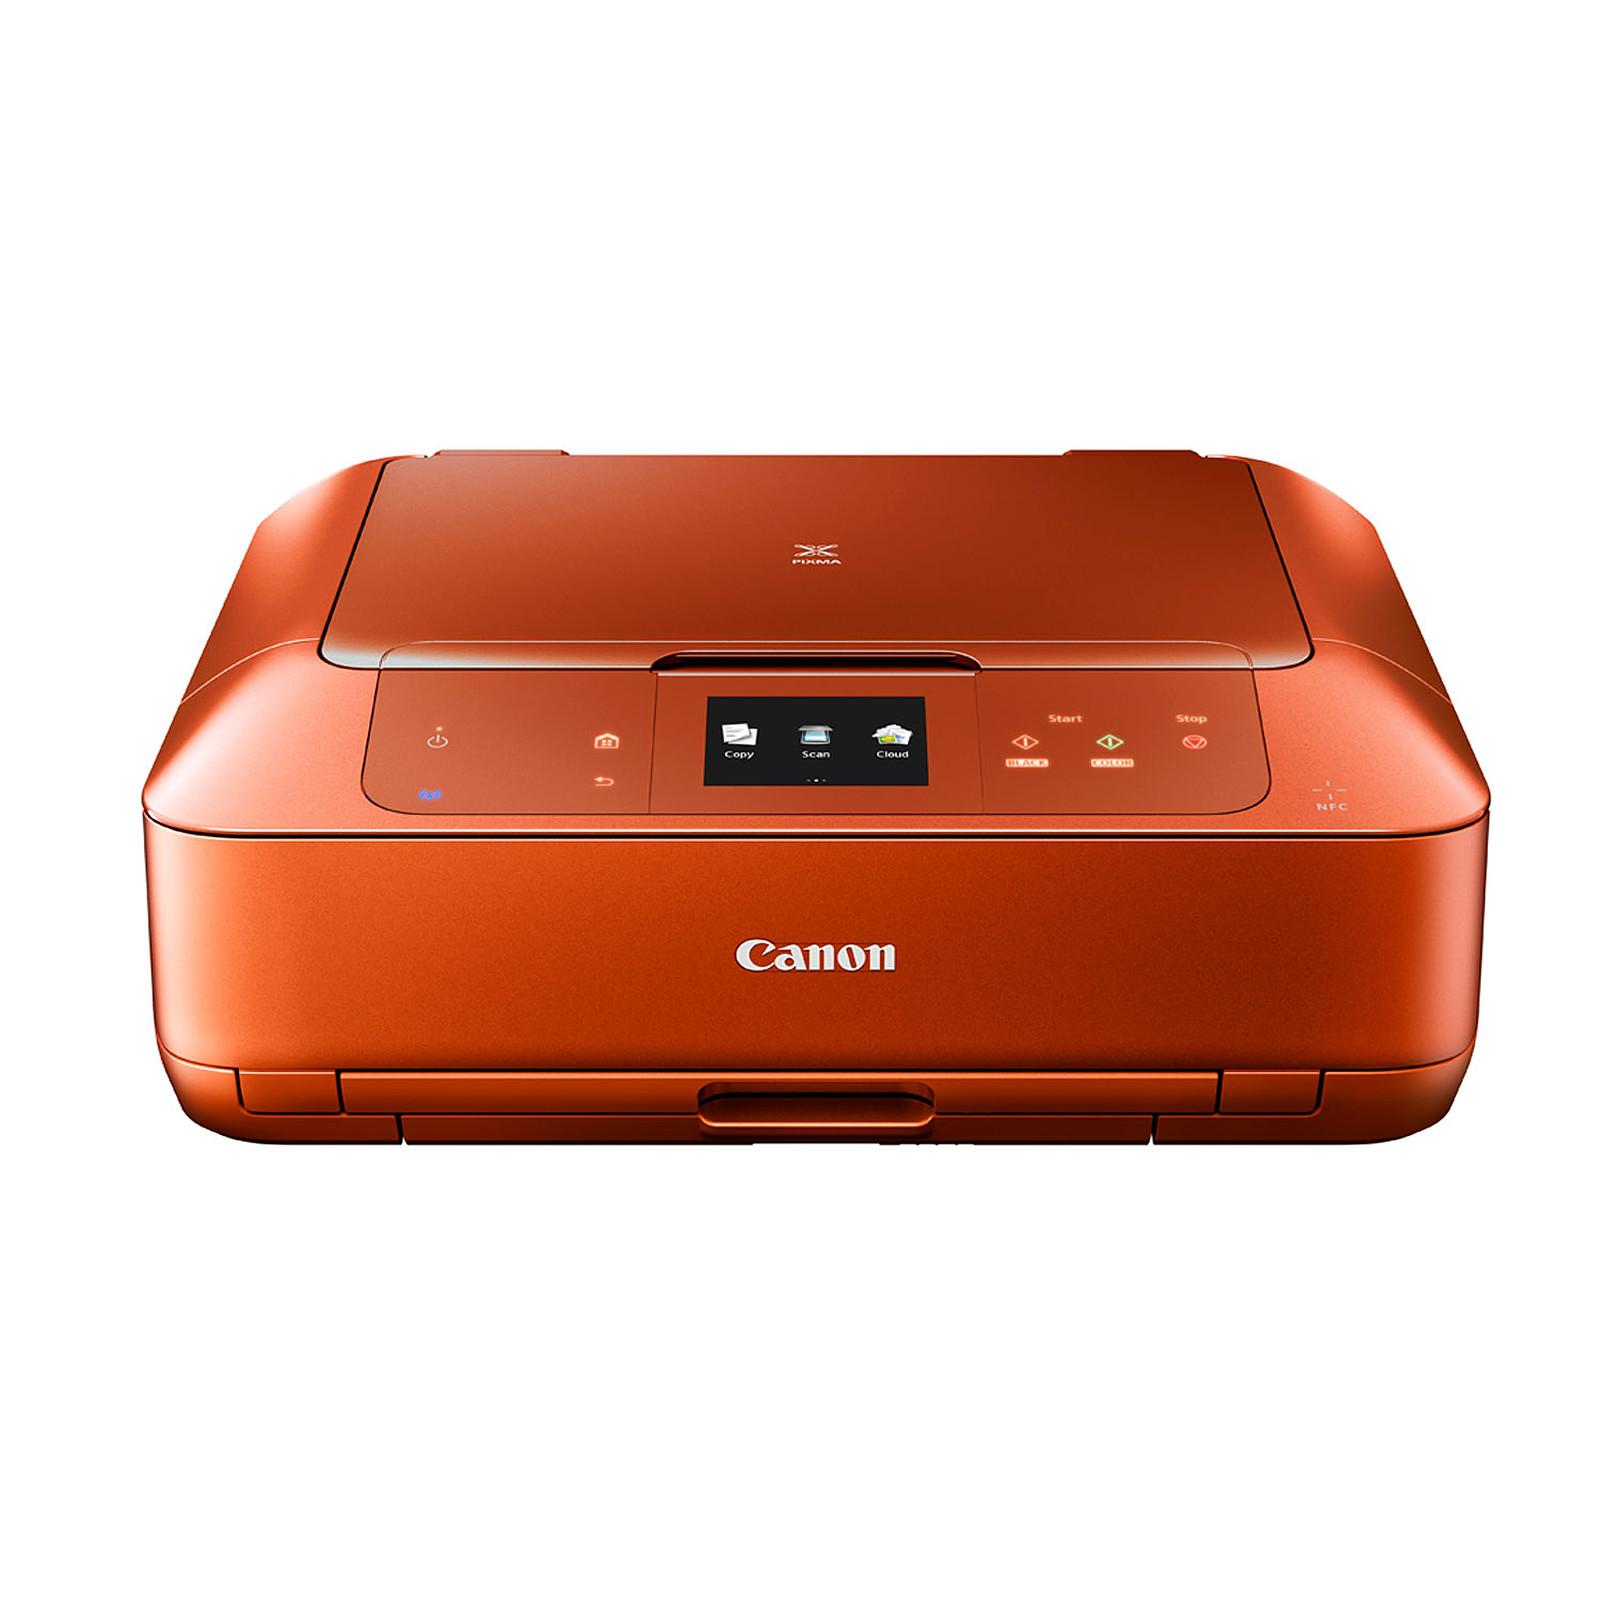 Canon PIXMA MG7550 Orange